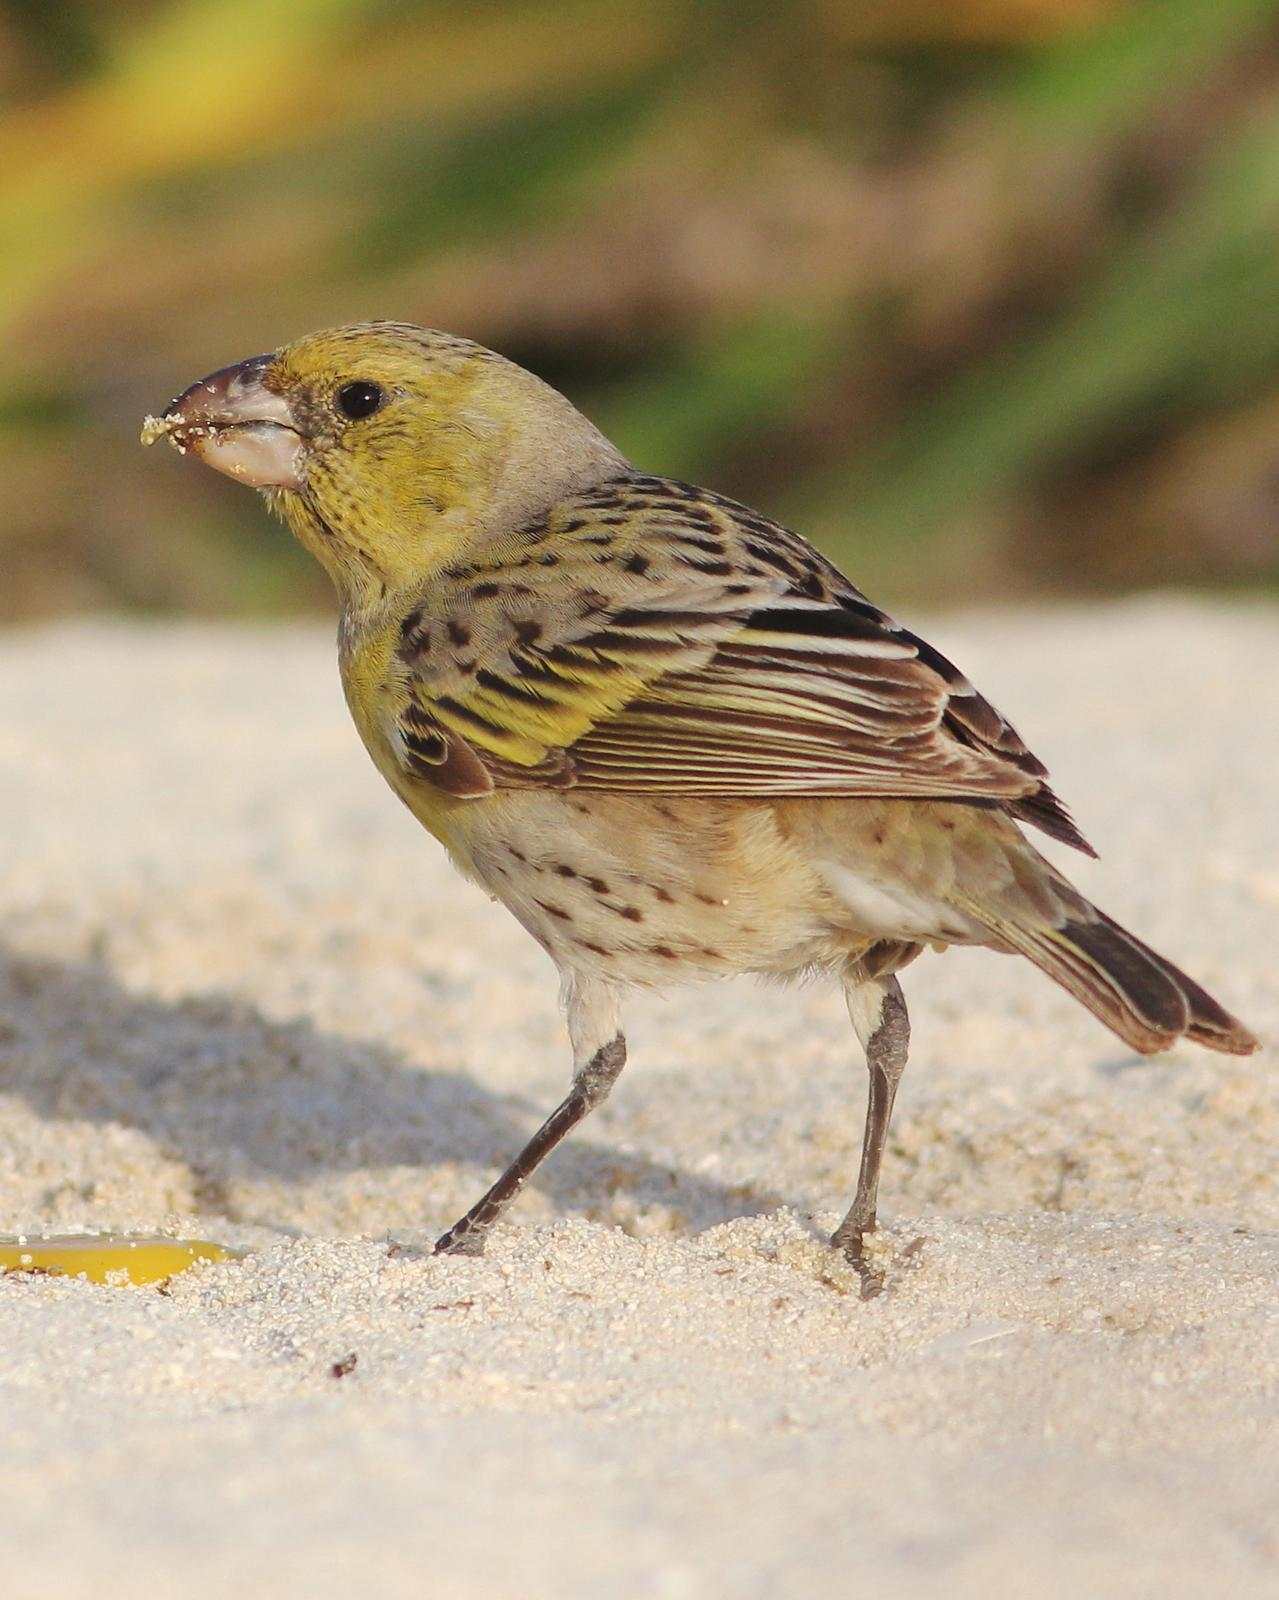 Laysan Finch Photo by Cameron Rutt